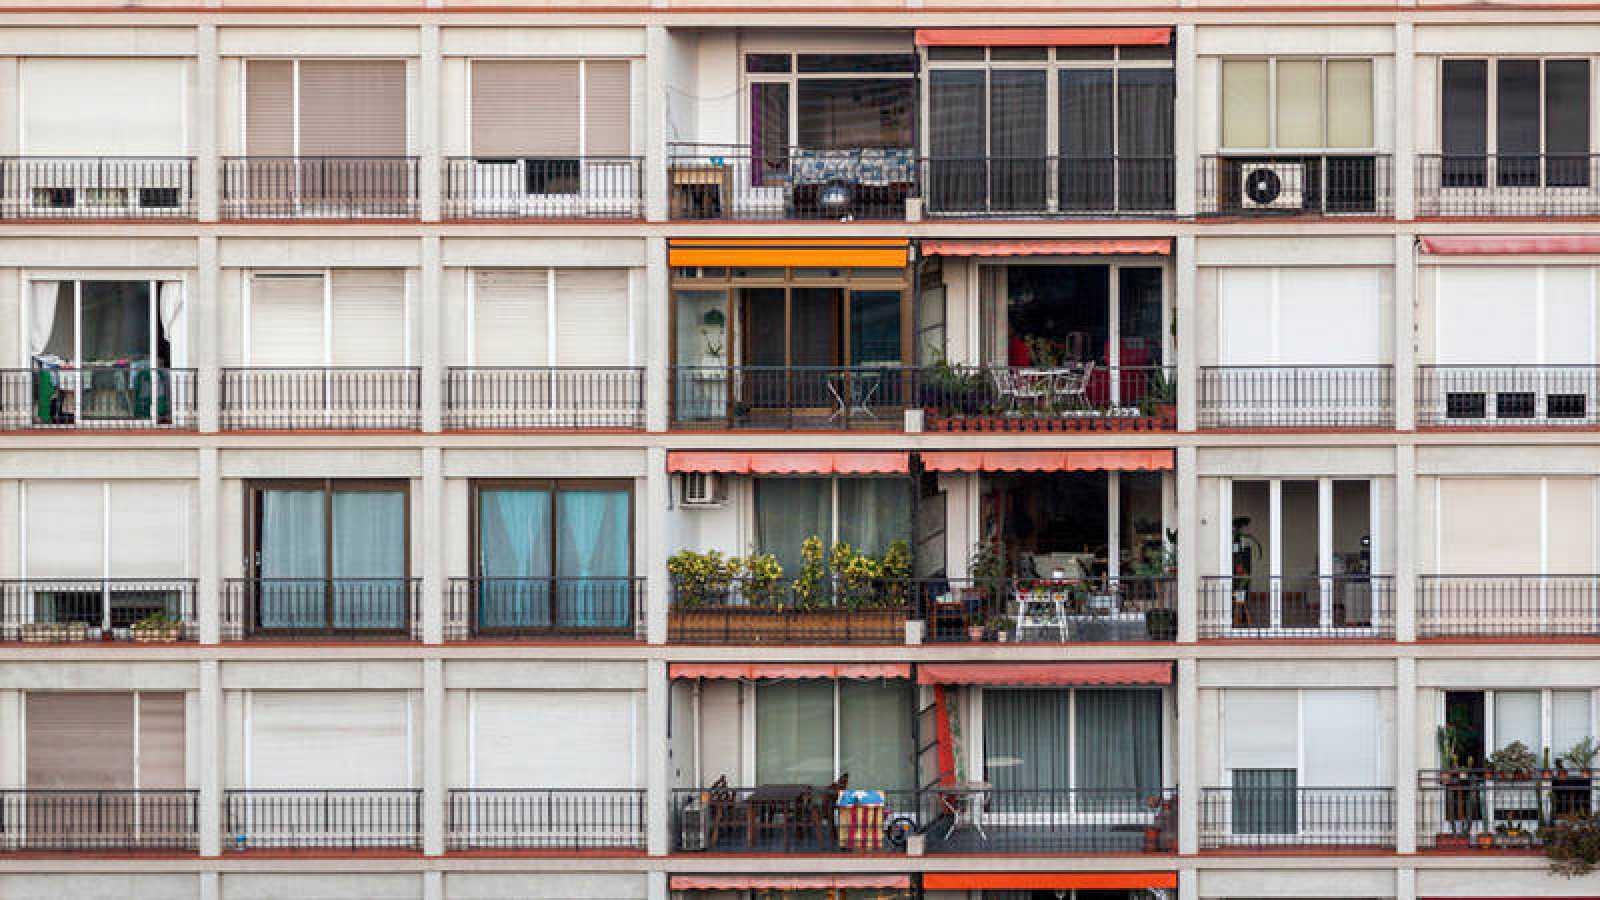 Edificio de viviendas en Barcelona